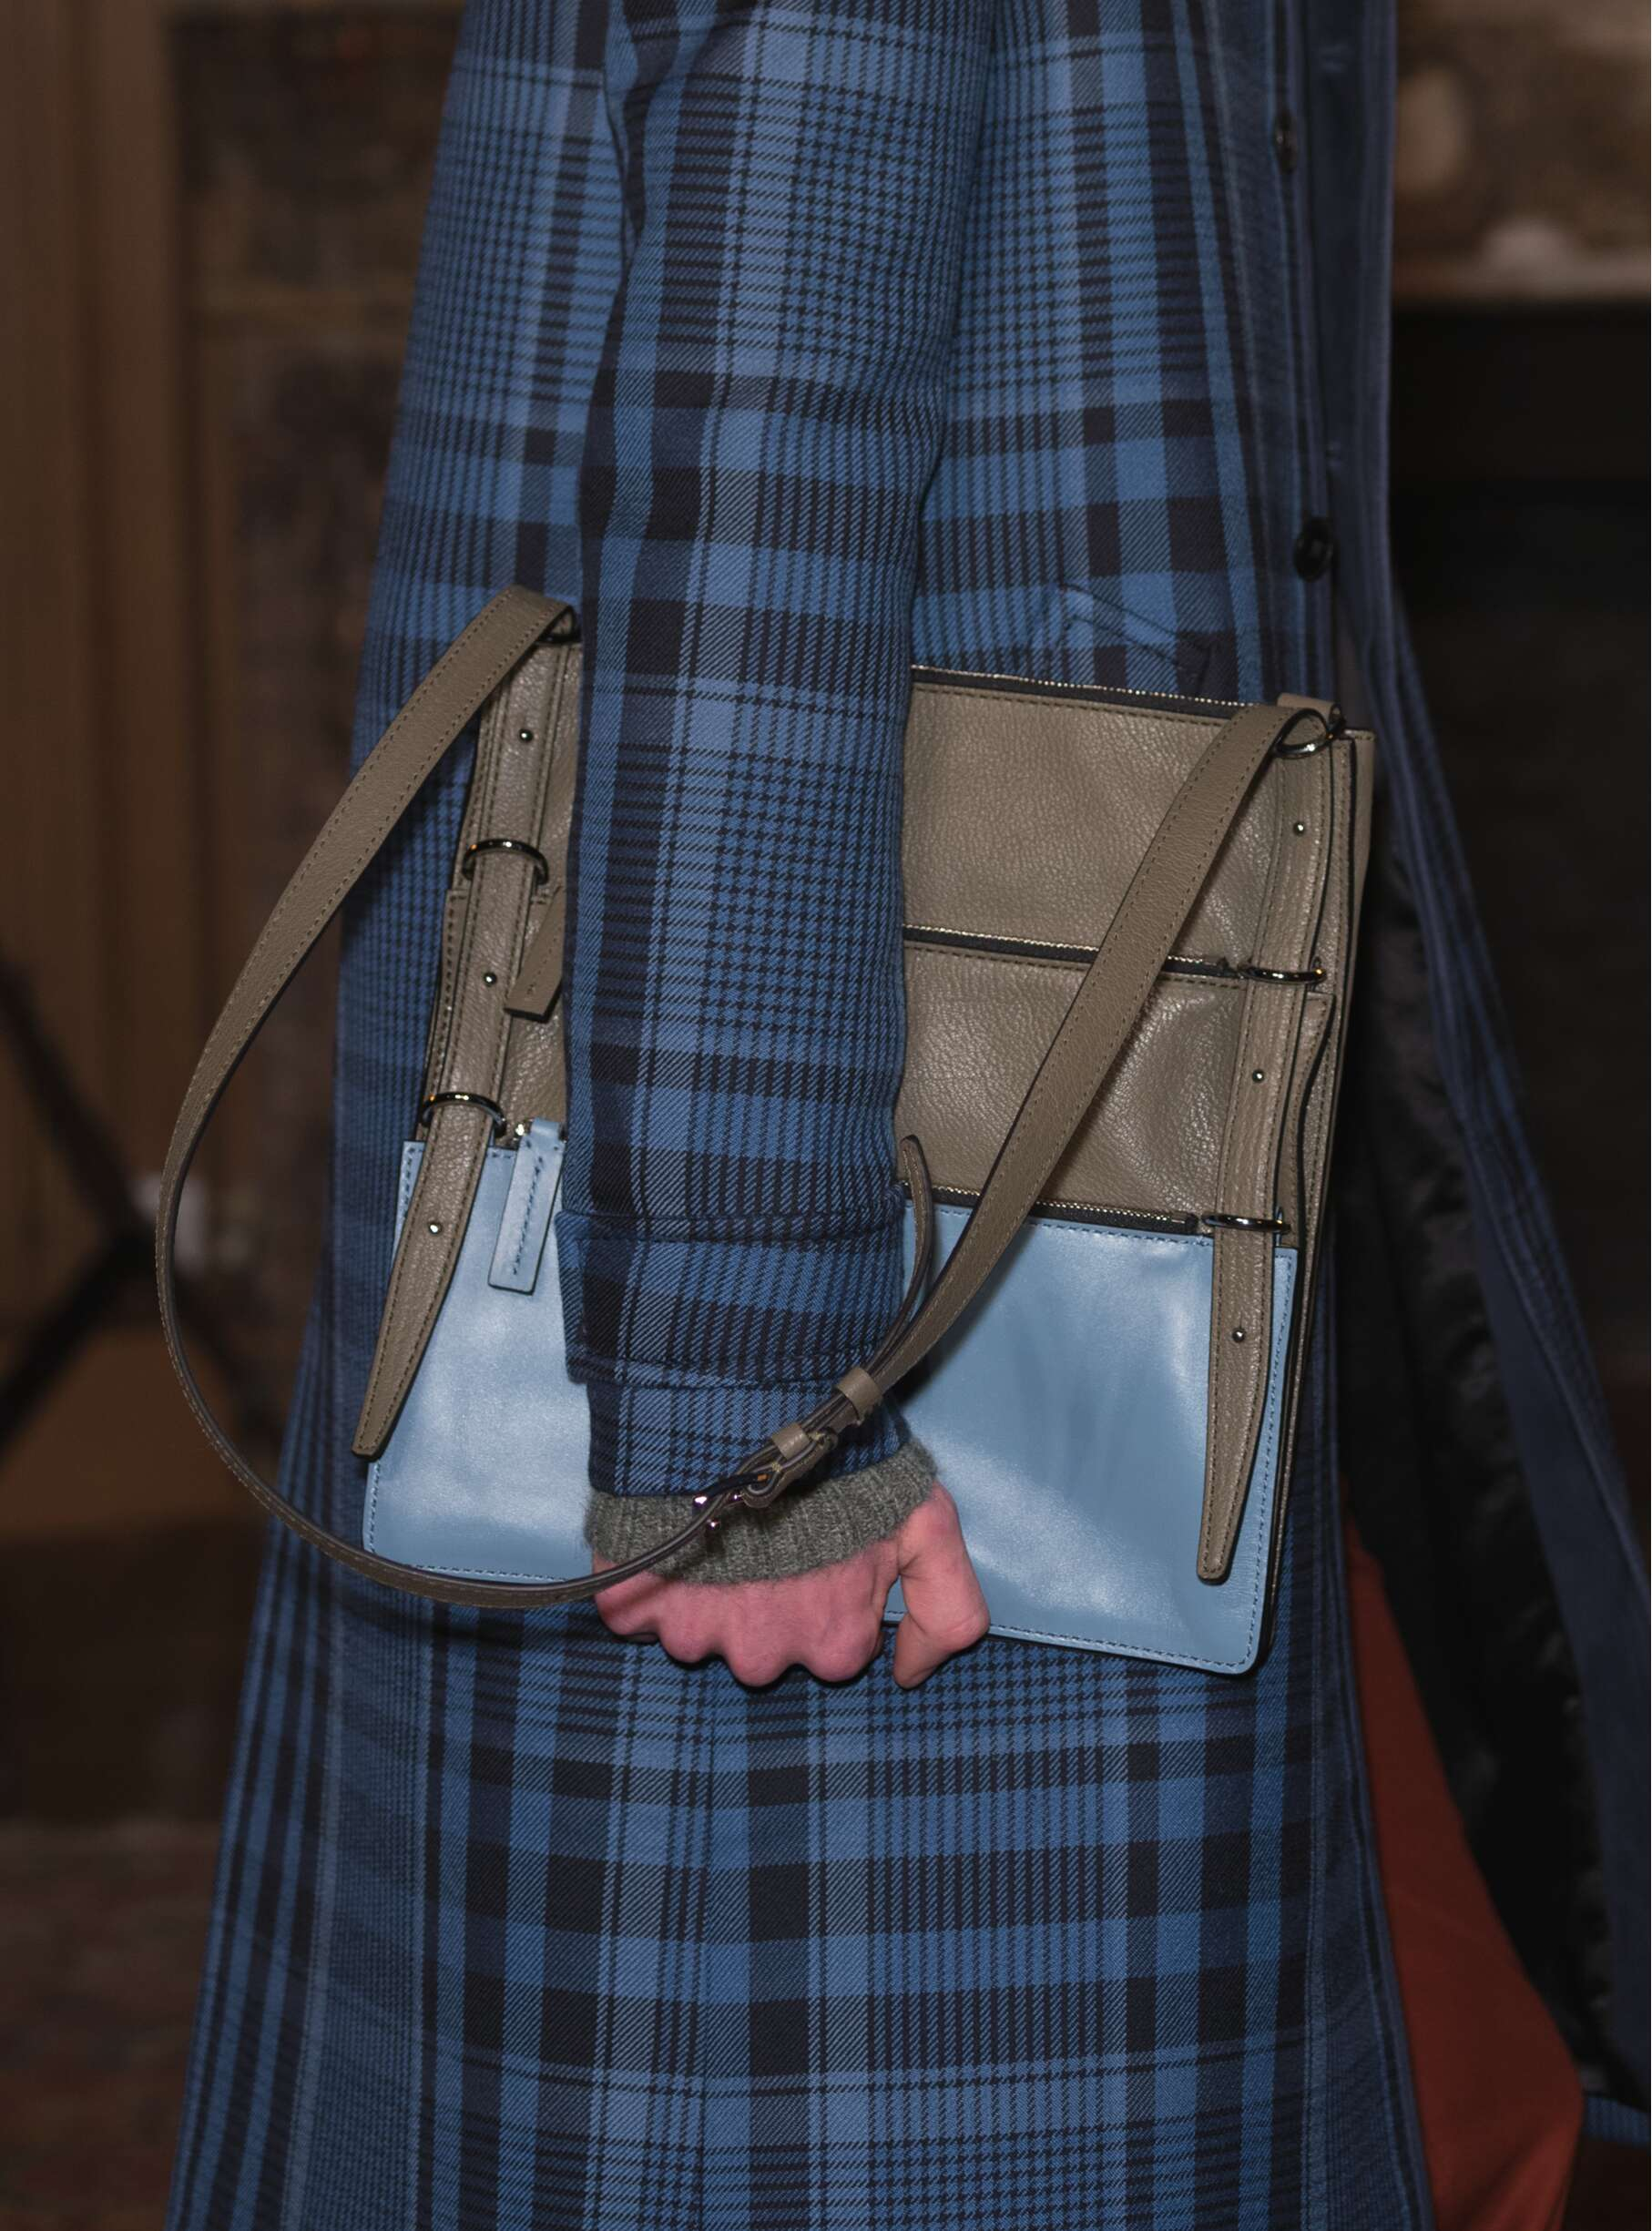 Valentino Bag Paris Fashion Week